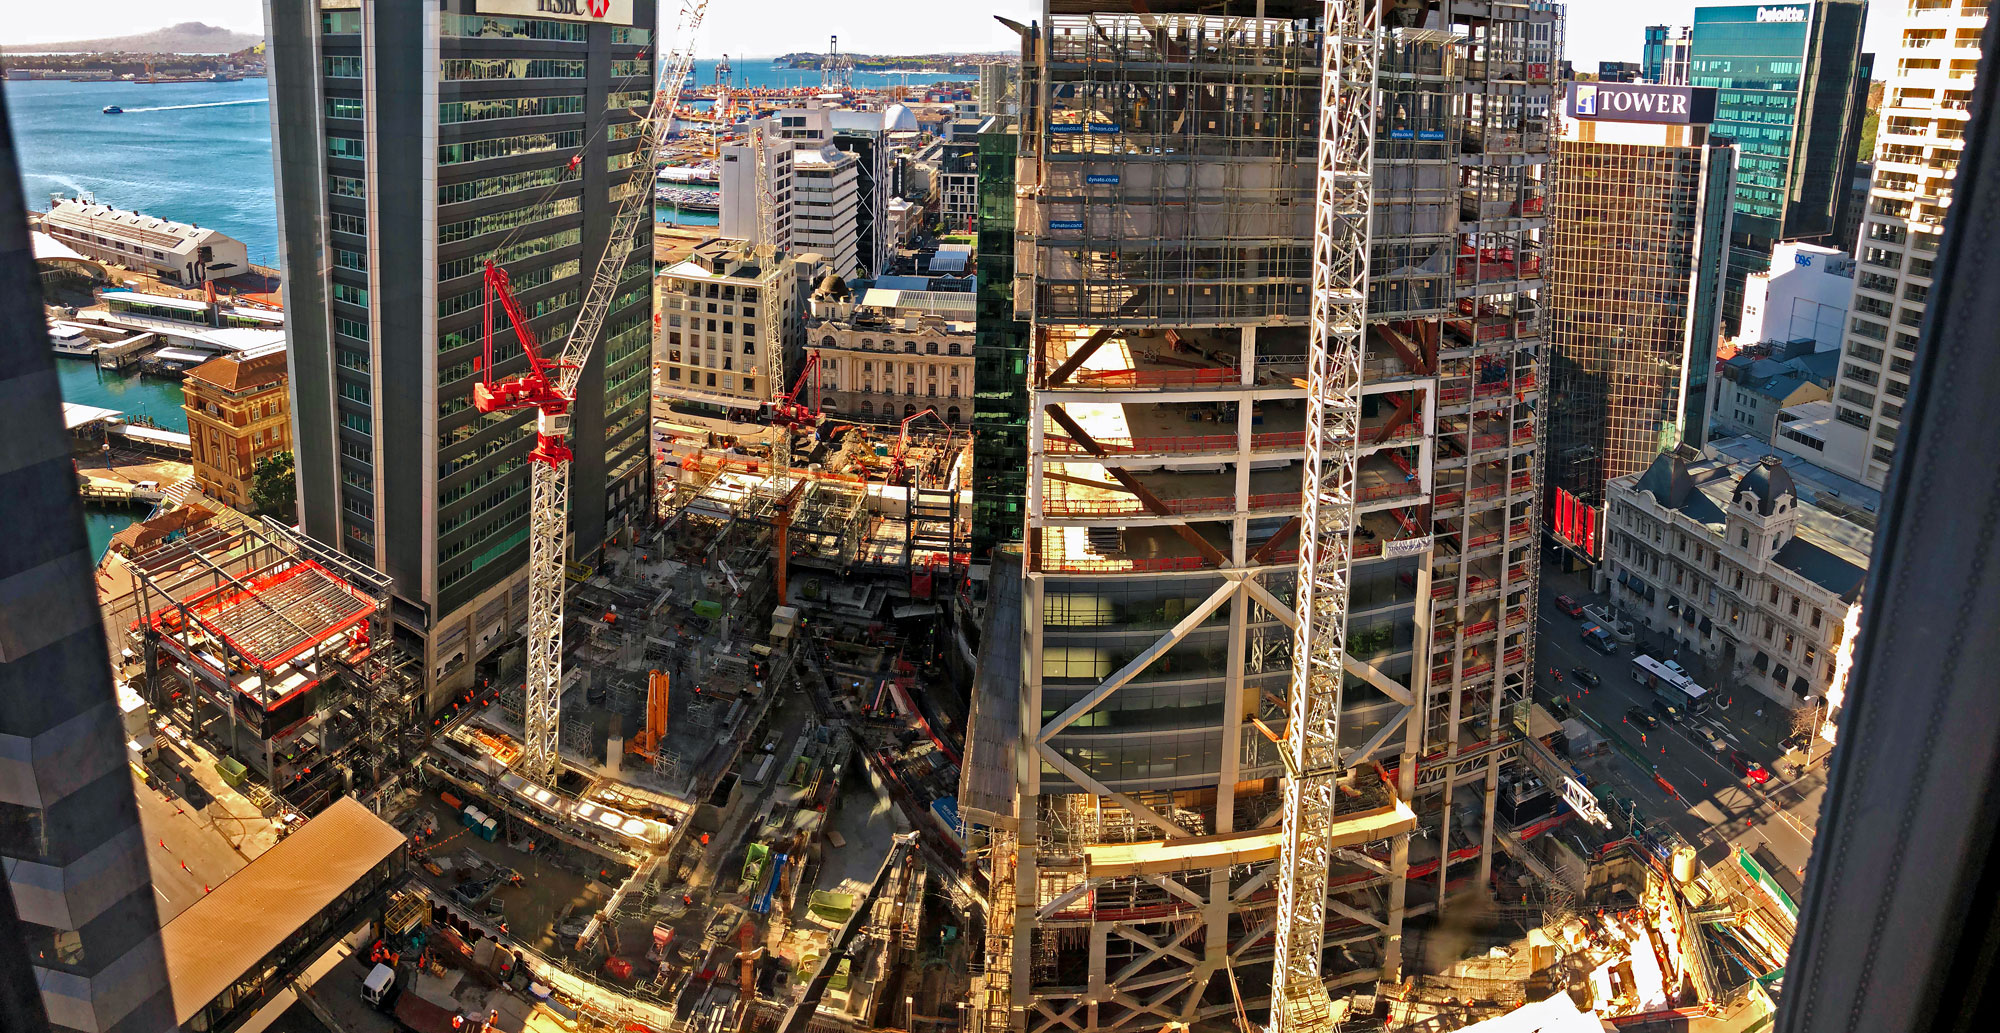 Commercial Bay development July 2018